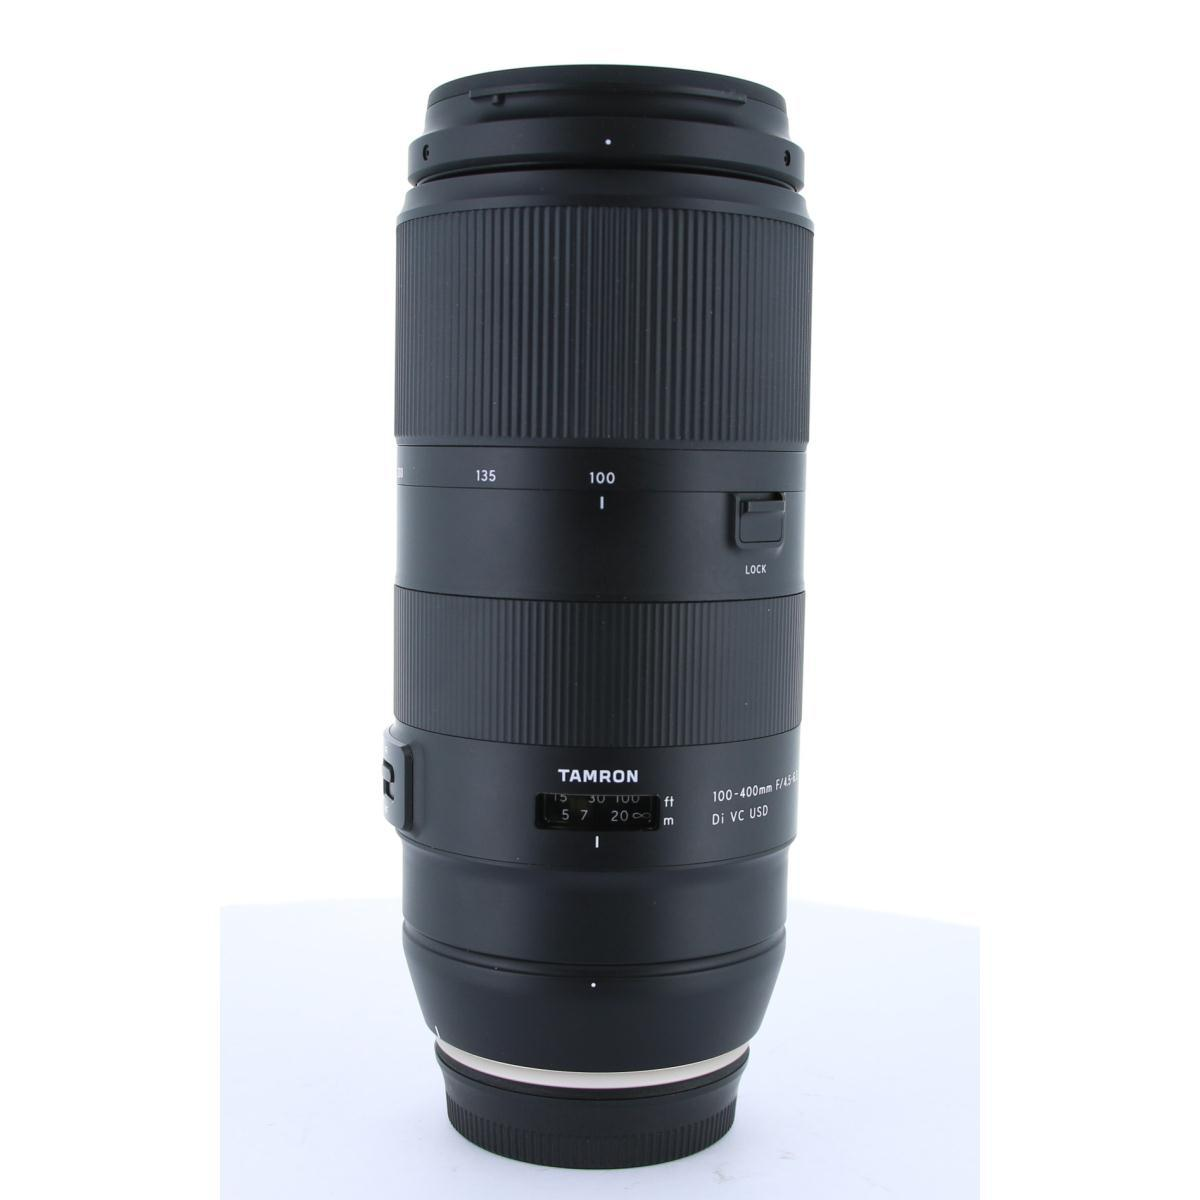 TAMRON EOS(A035)100-400mm F4.5-6.3【中古】